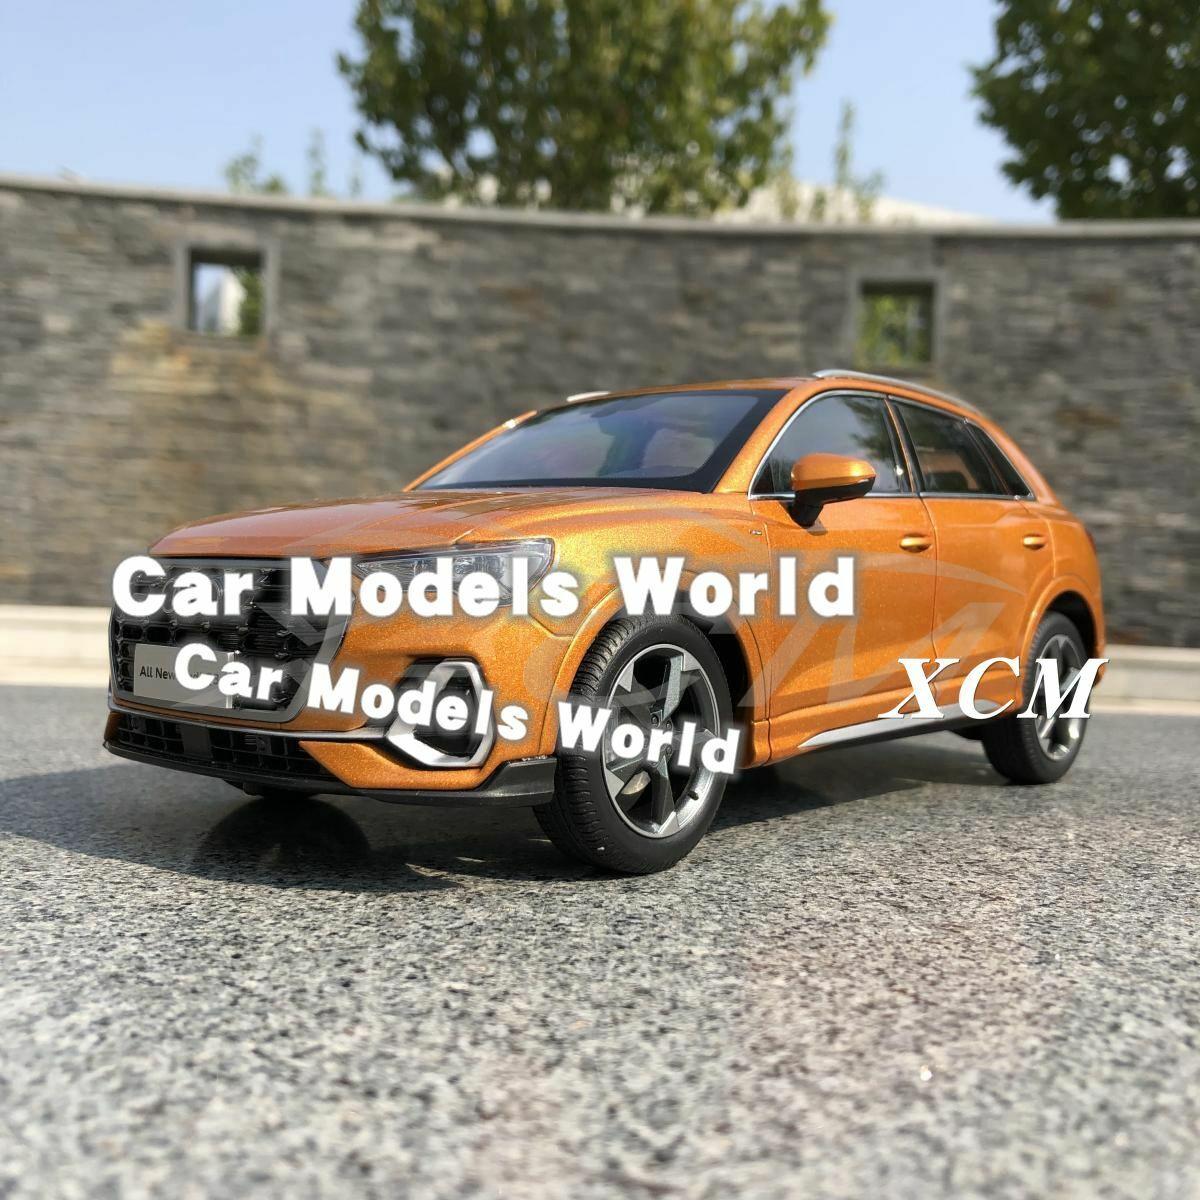 voiture Modelll for All New Q3 2019 1 18 (Orange) + SMALL Geschenk